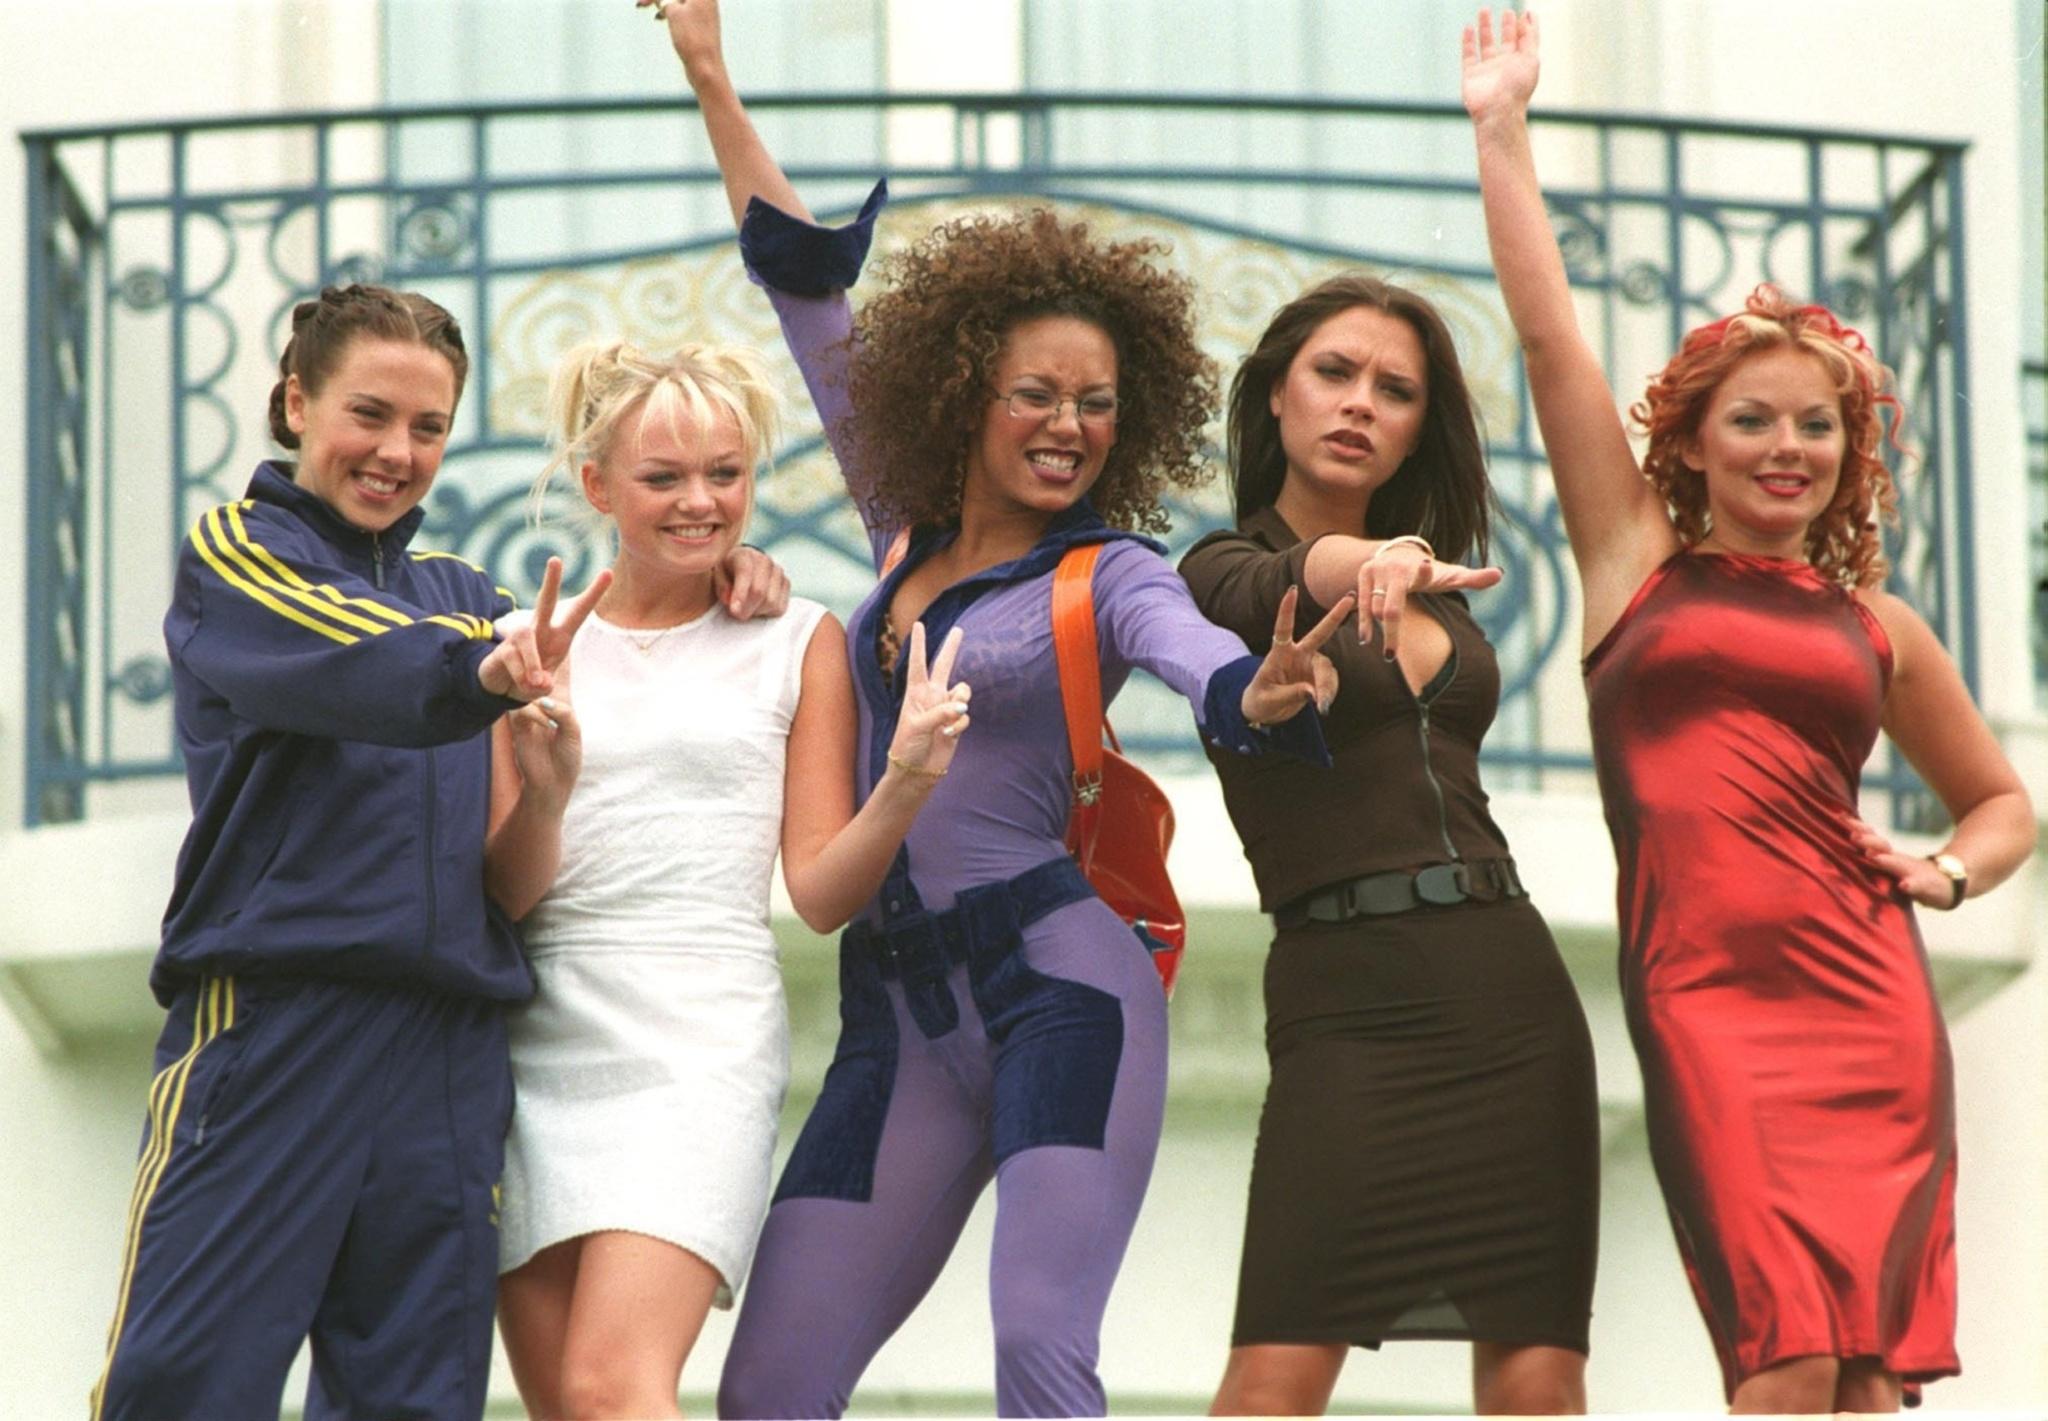 Spice Girls snoep, ken jij het nog? | FavorFlav